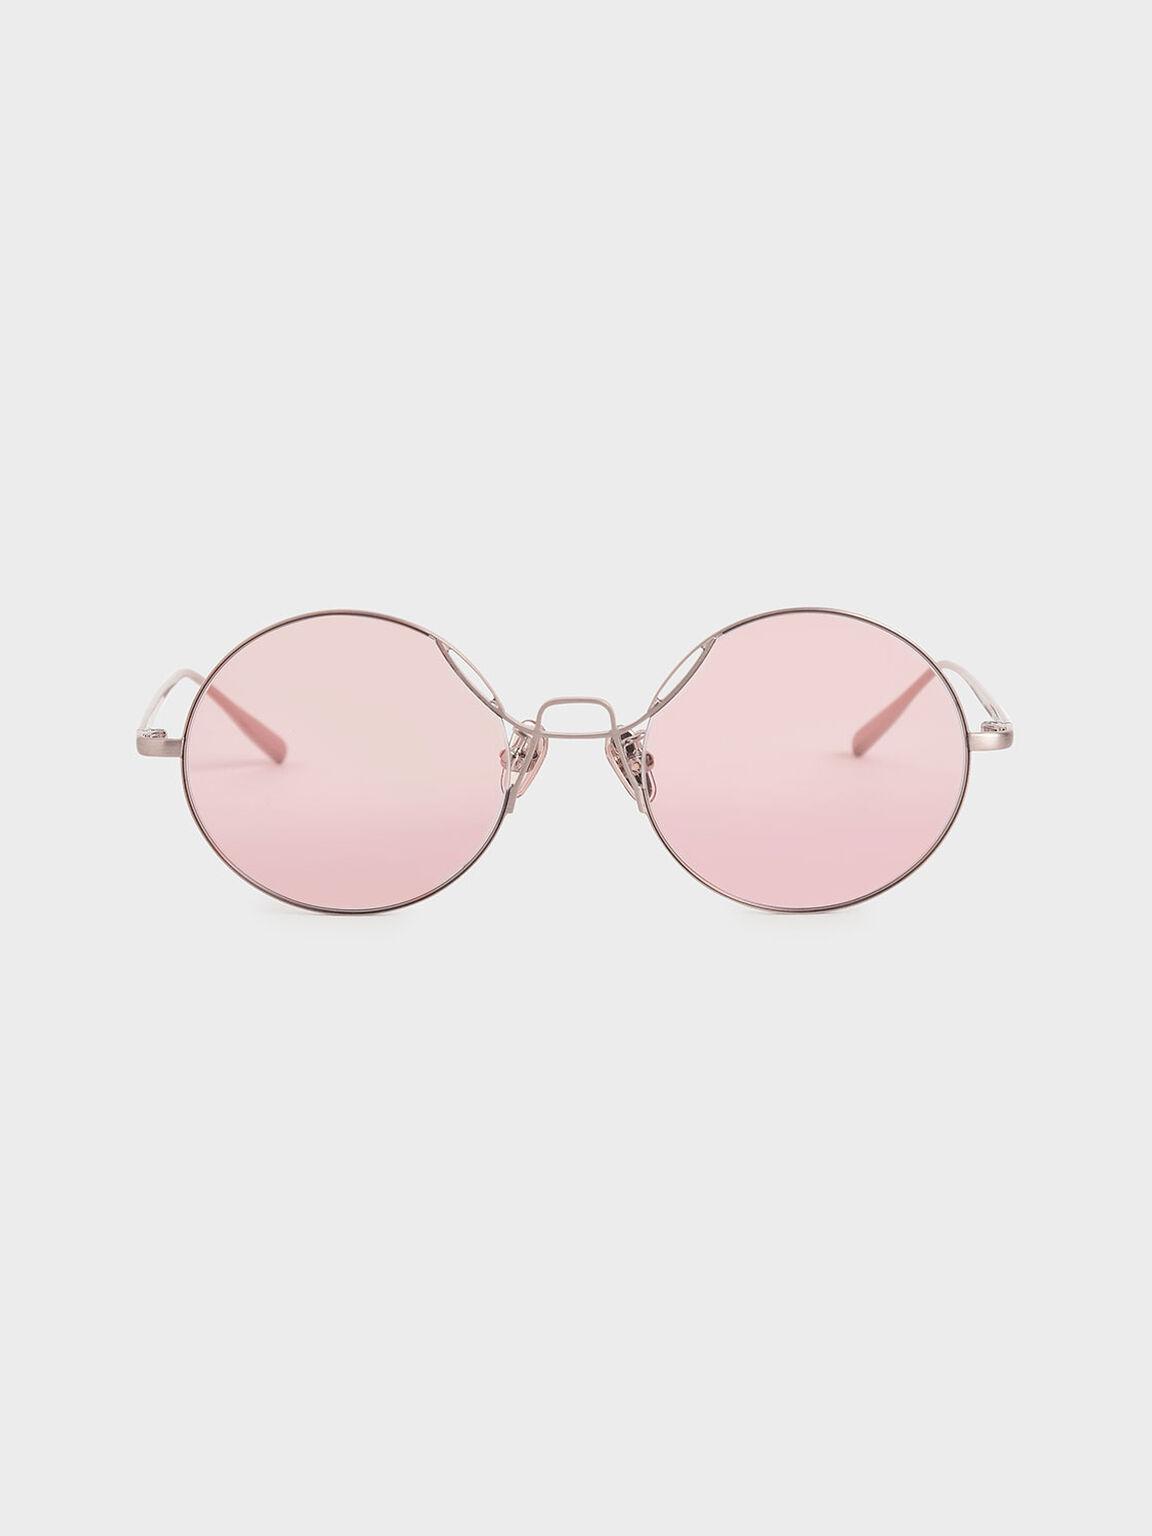 Kacamata Round Tinted, Rose Gold, hi-res